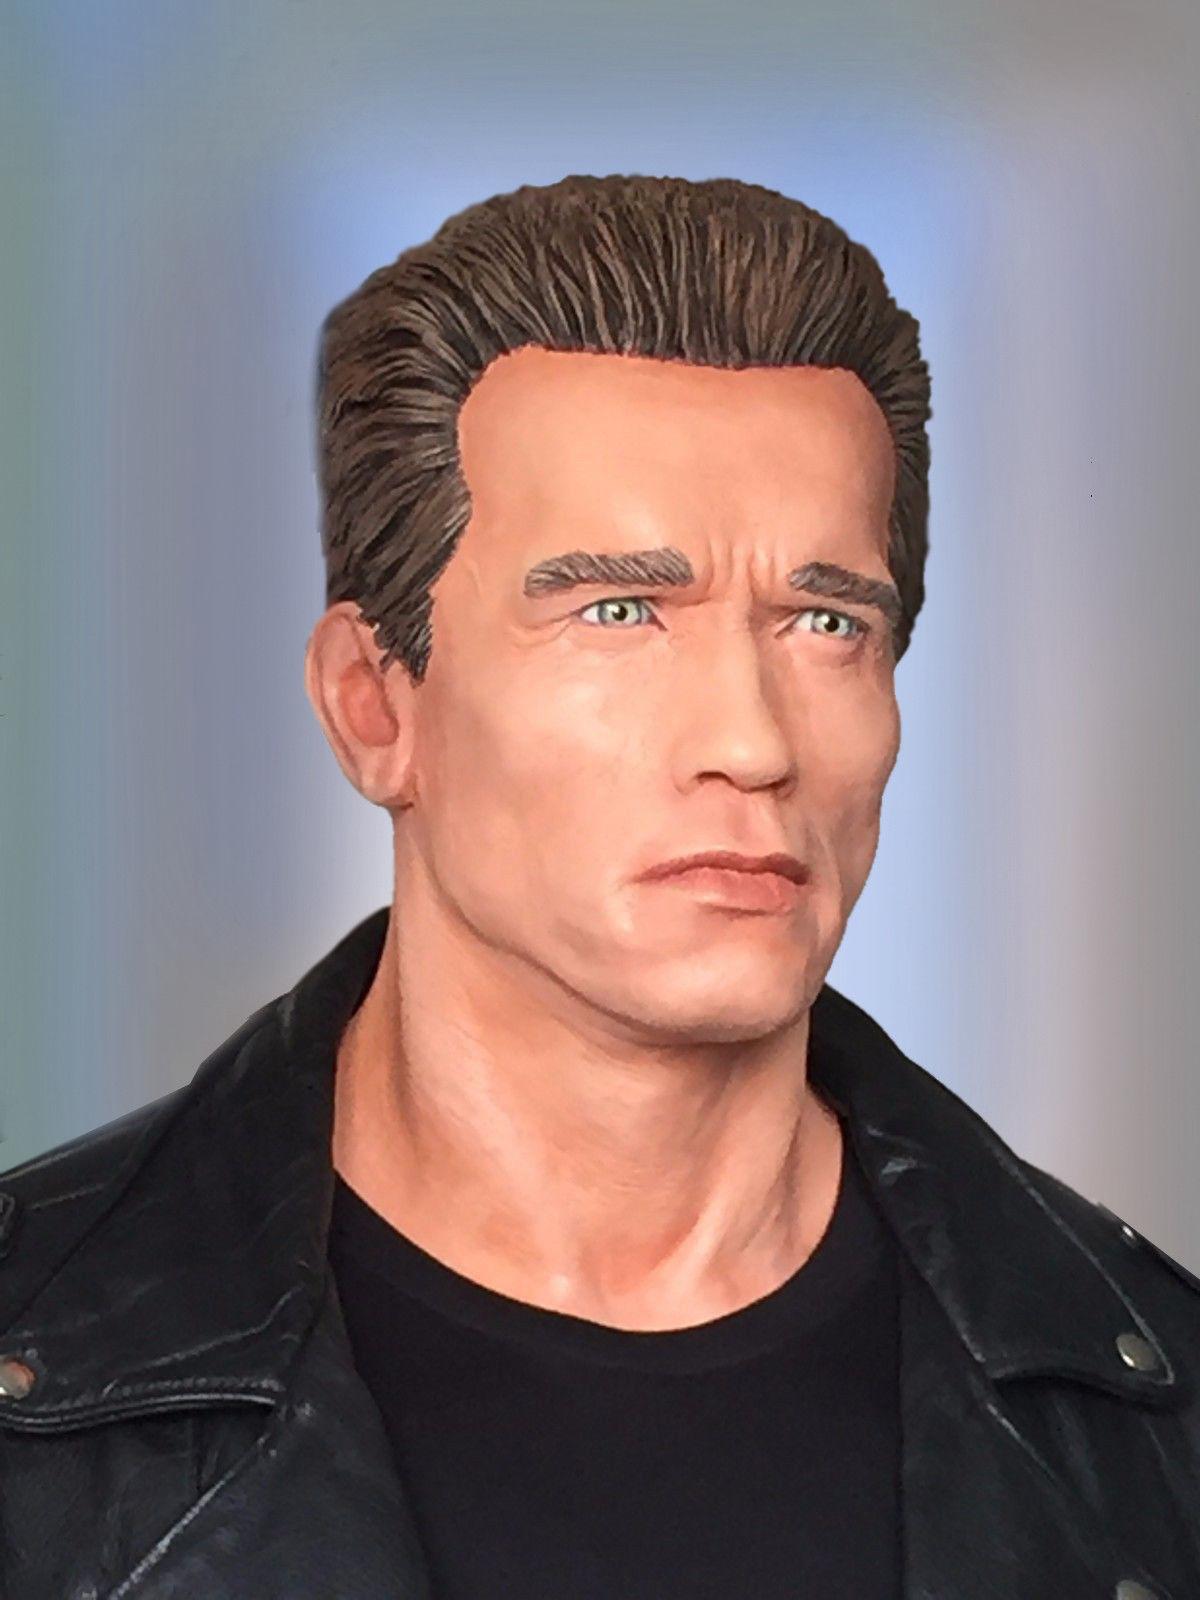 Bustes terminator Arnold Schwarzenegger fan made S-l16010